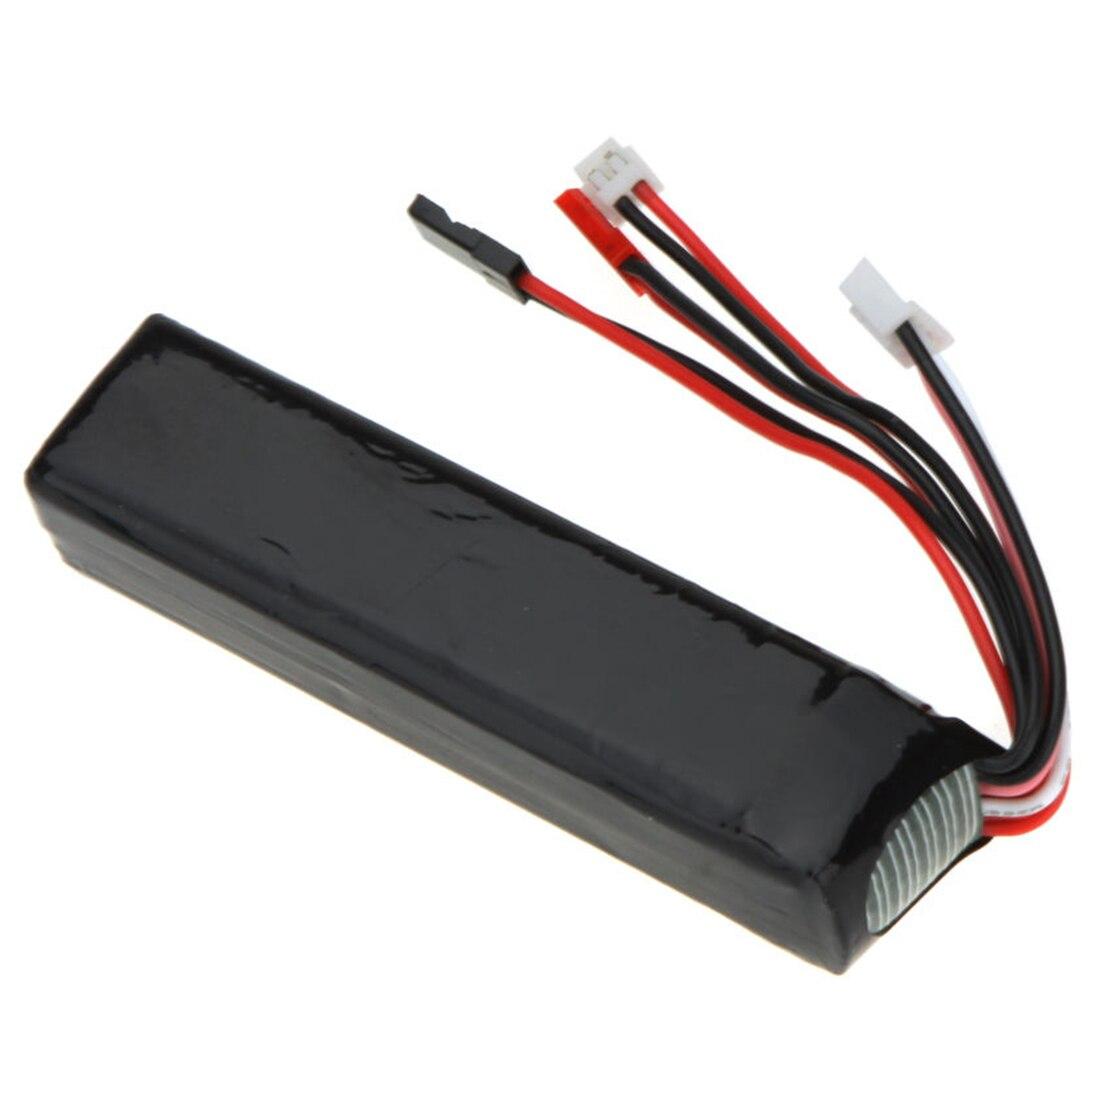 SCLS High Quality LiPo Battery 11.1V 2200mAh for Futaba JR Walkera Devo7/10 WFLY